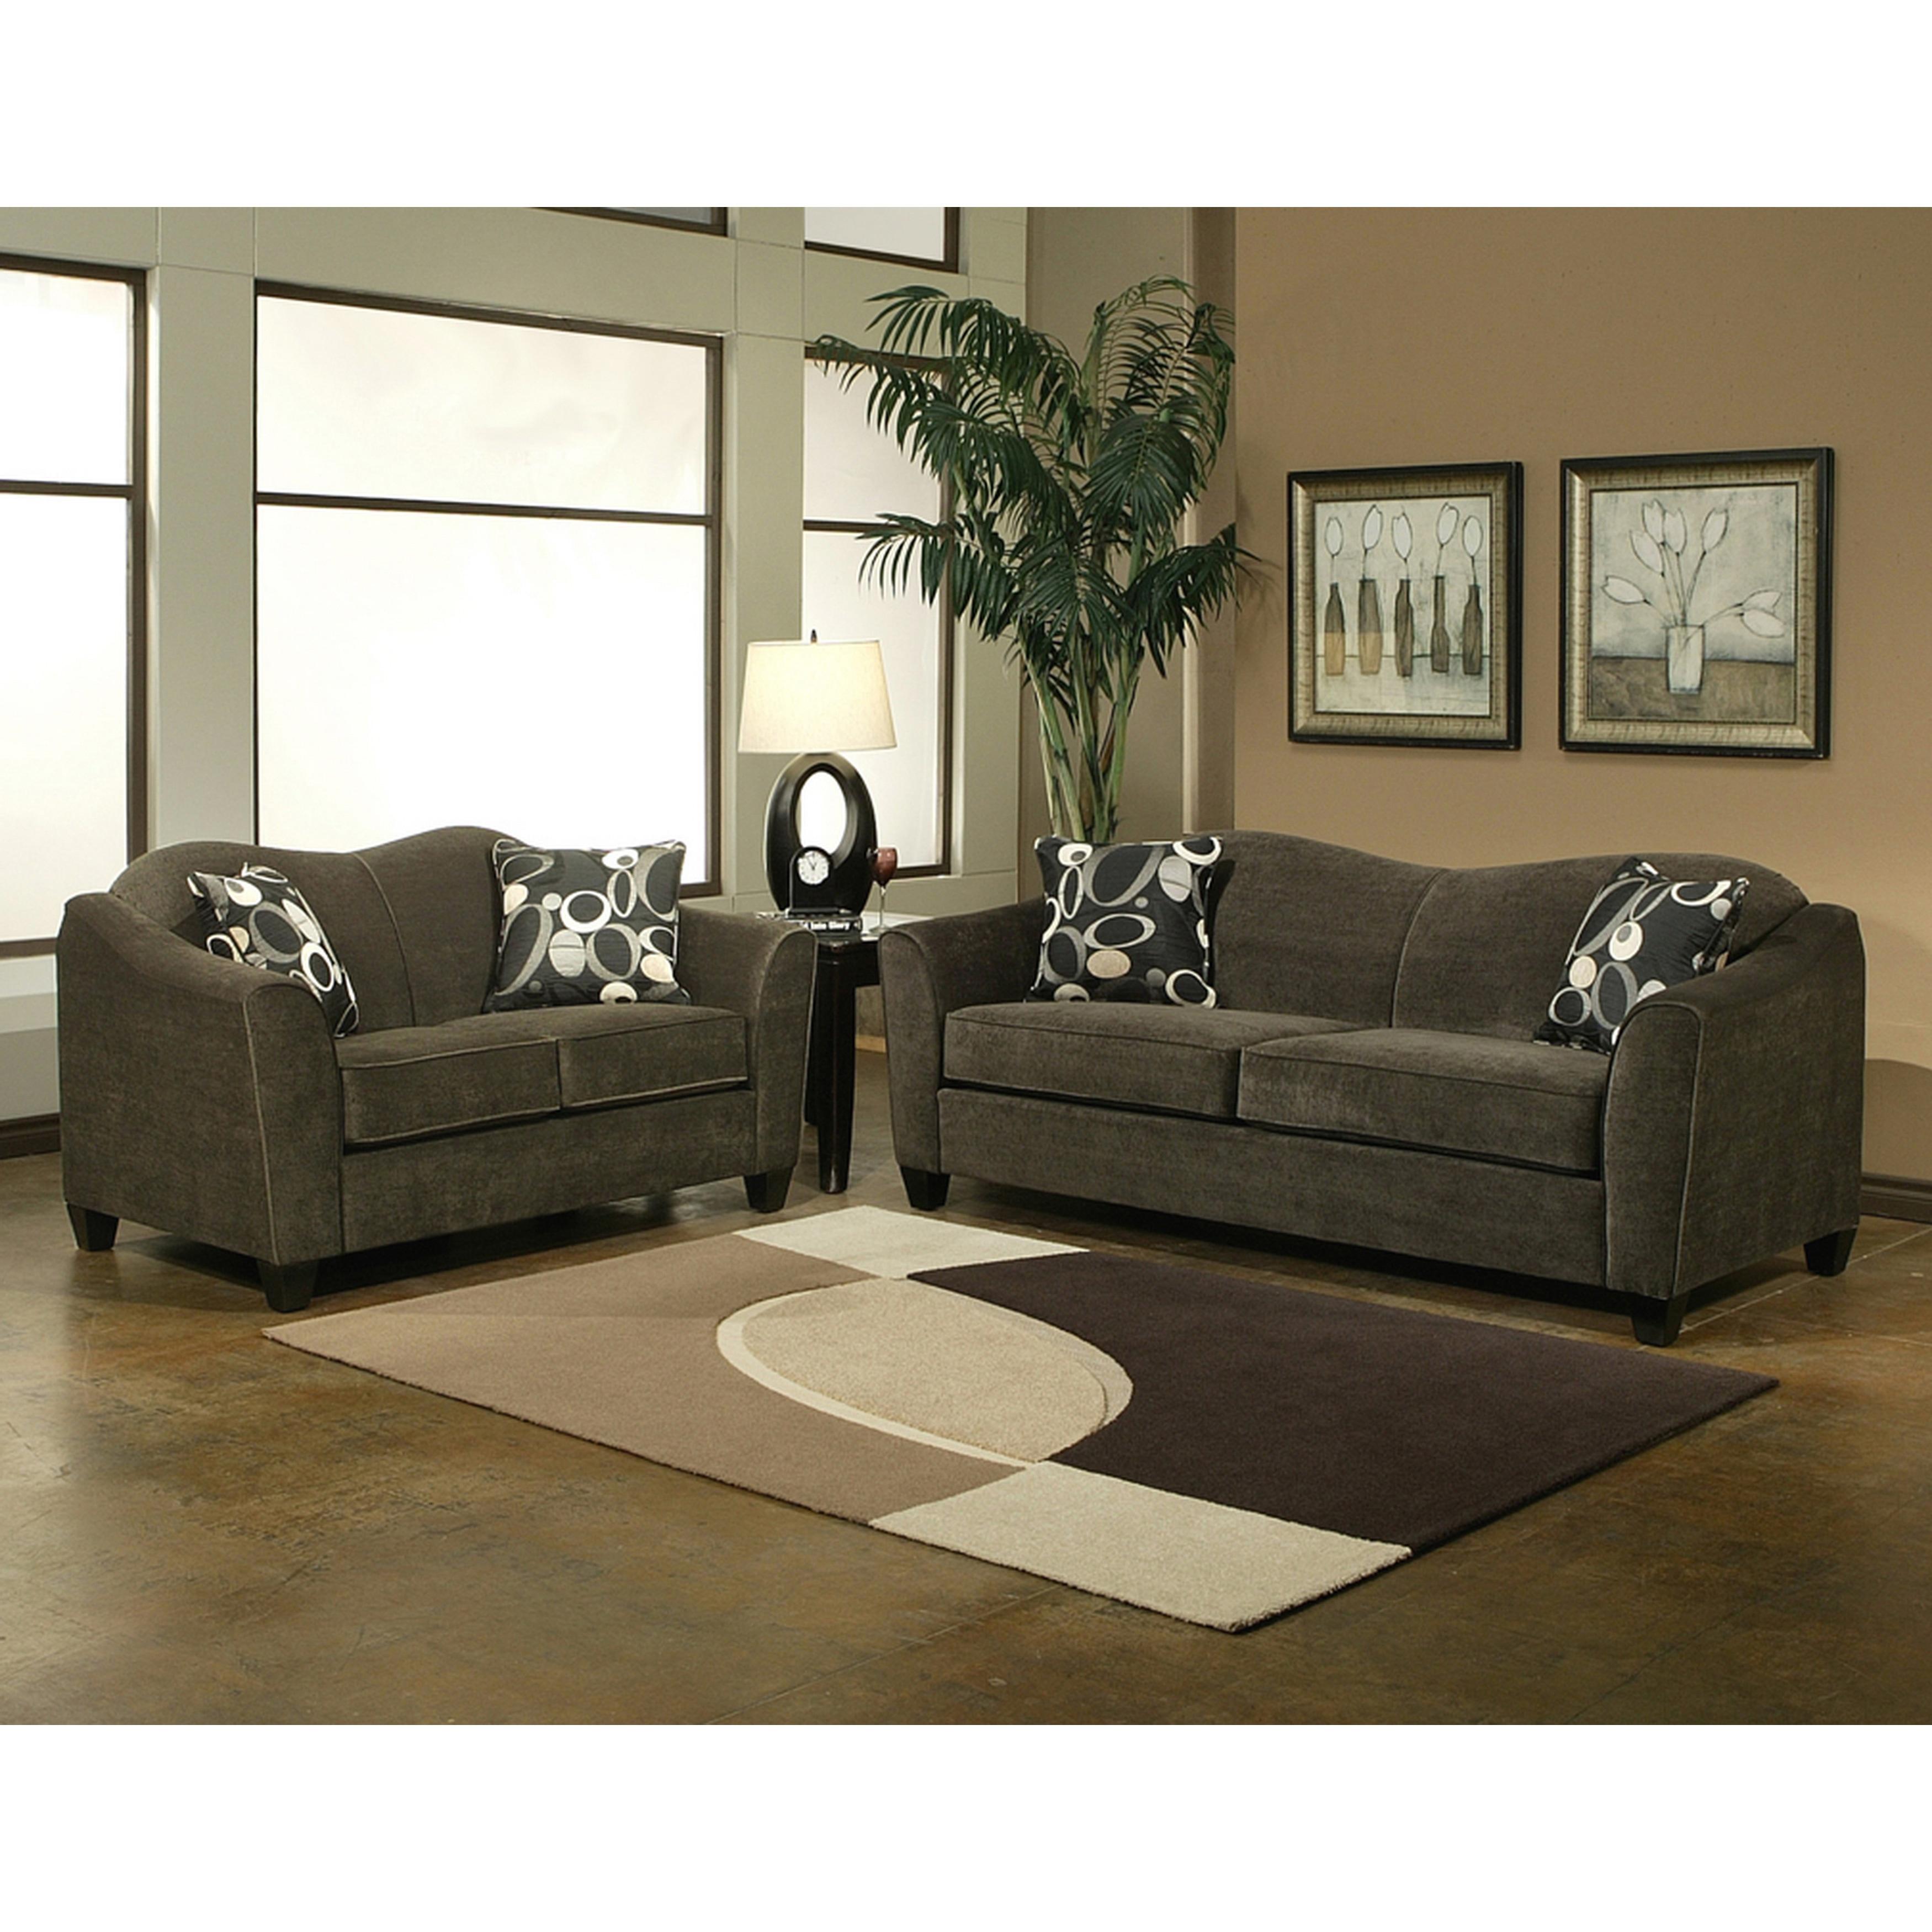 Piera Microsuede Sofa And Loveseat Set